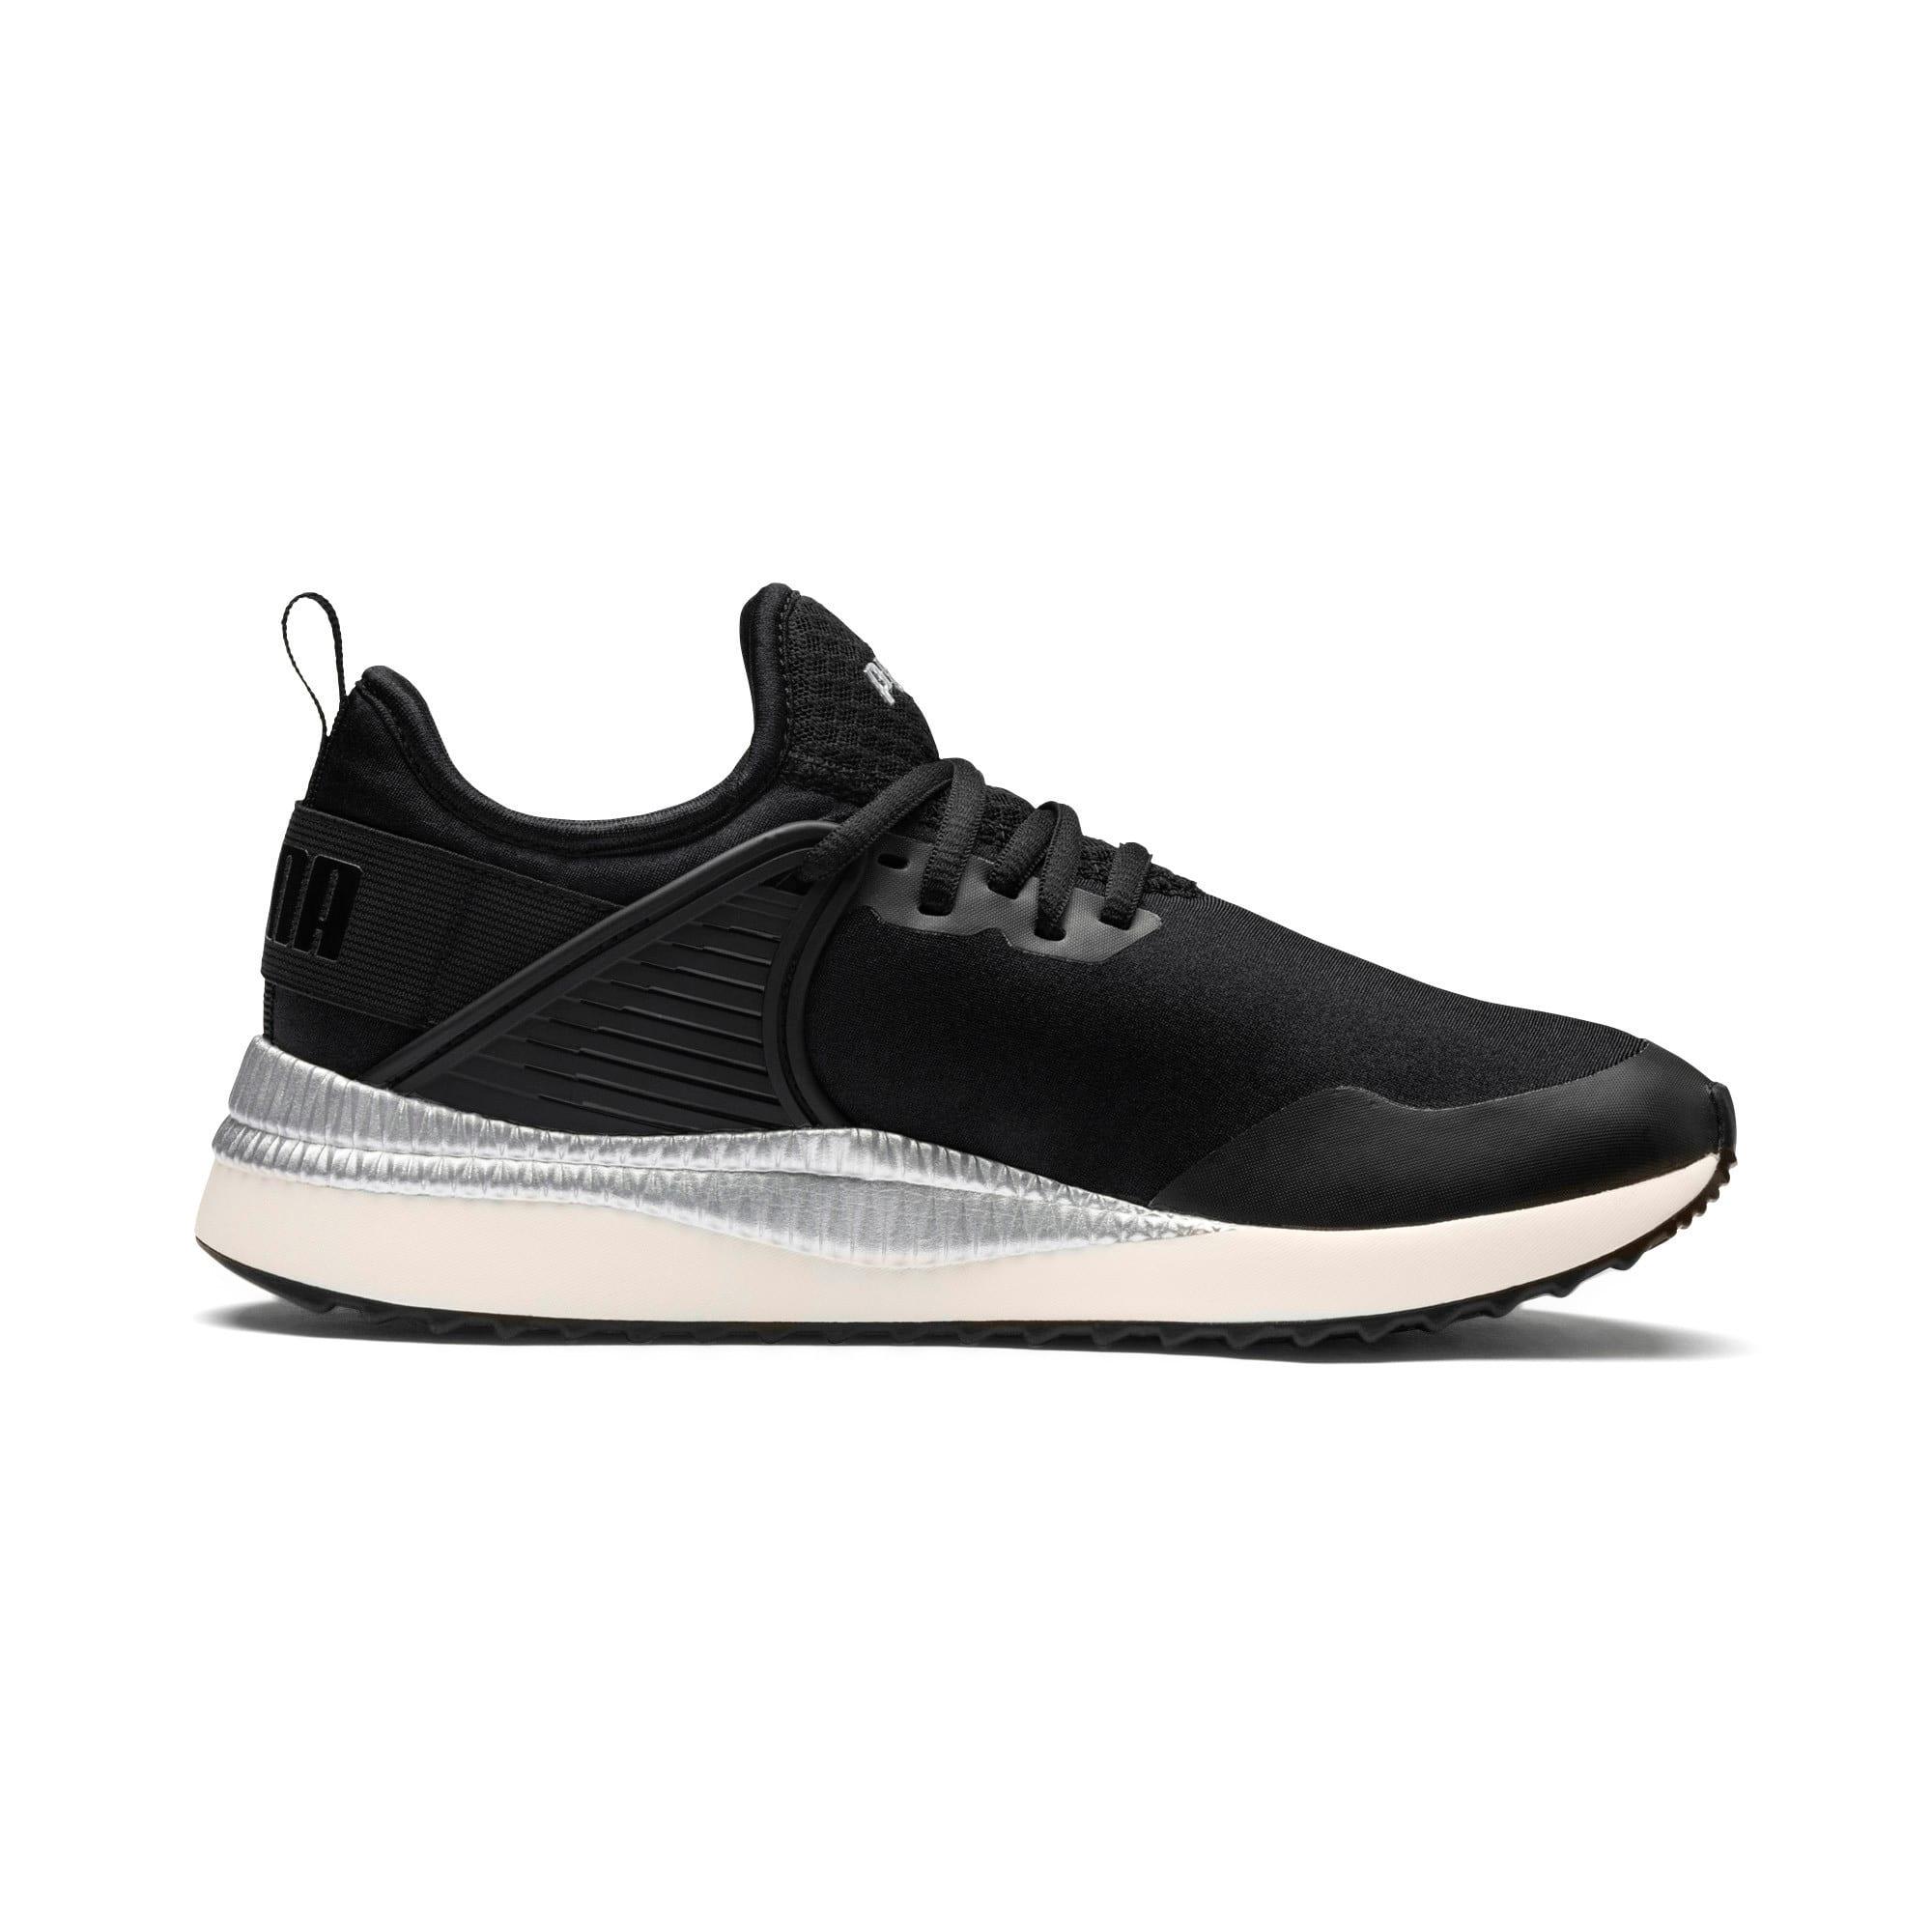 Thumbnail 5 of Pacer Next Cage ST2 Women's Sneakers, P Black-Black-Whisper White, medium